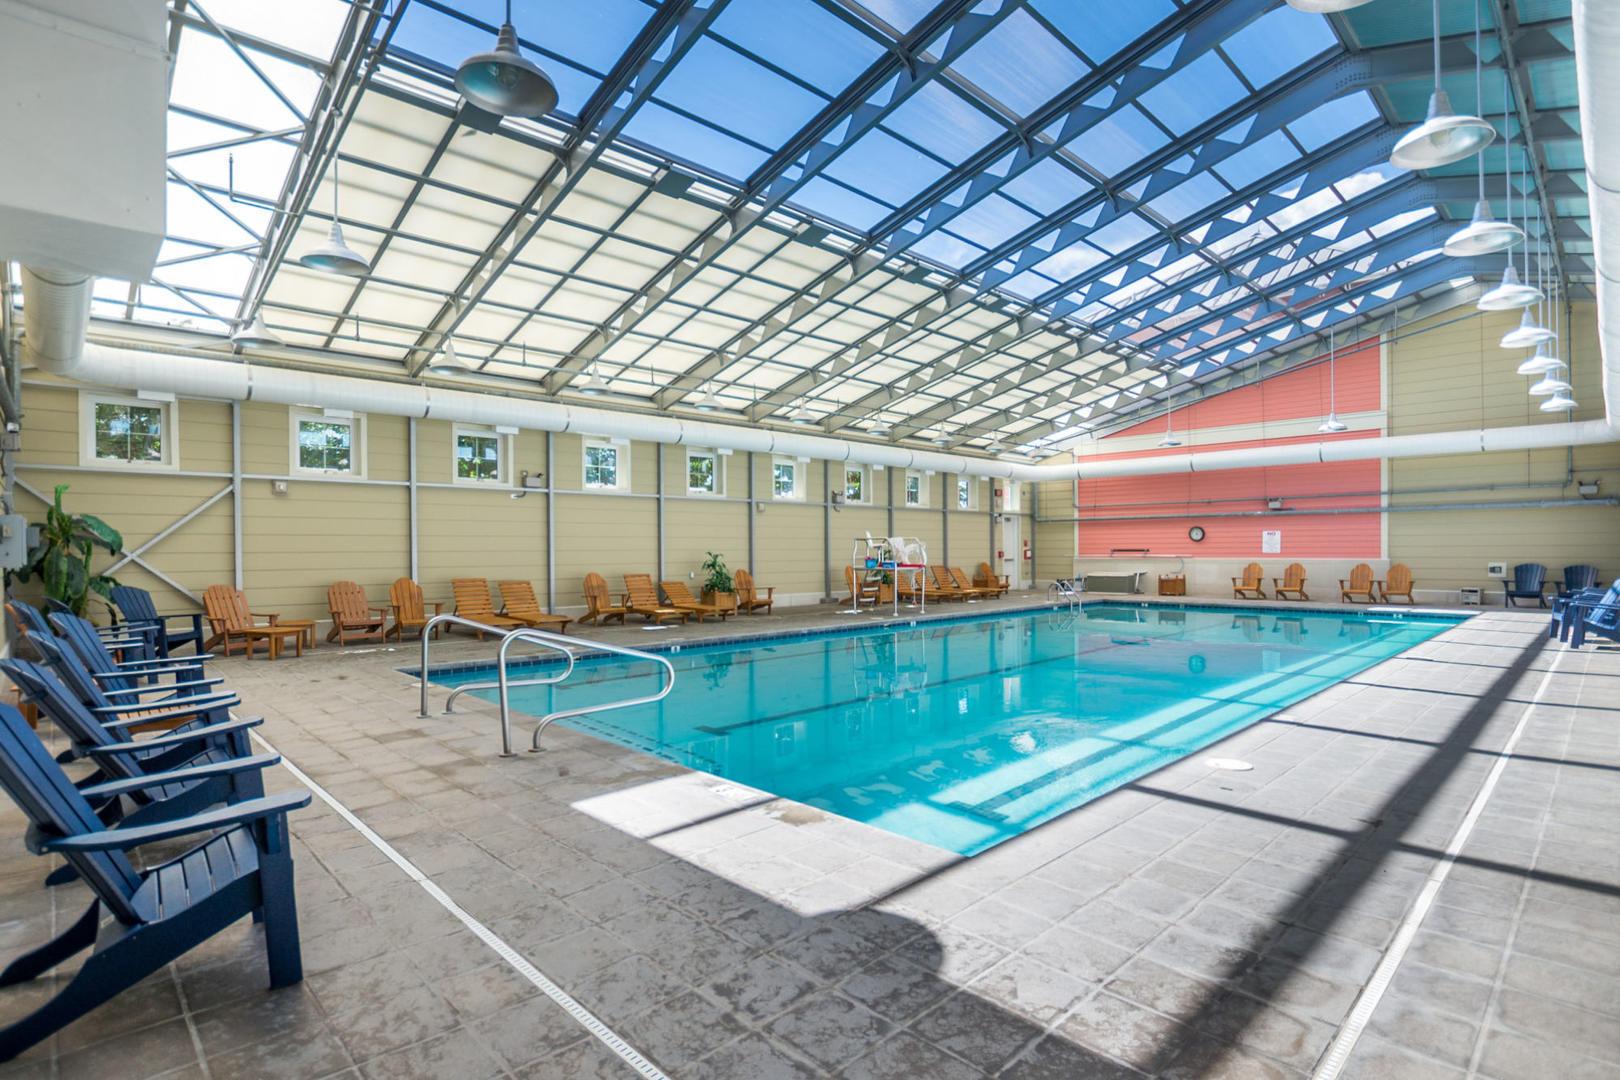 Sunset Island Indoor Pool